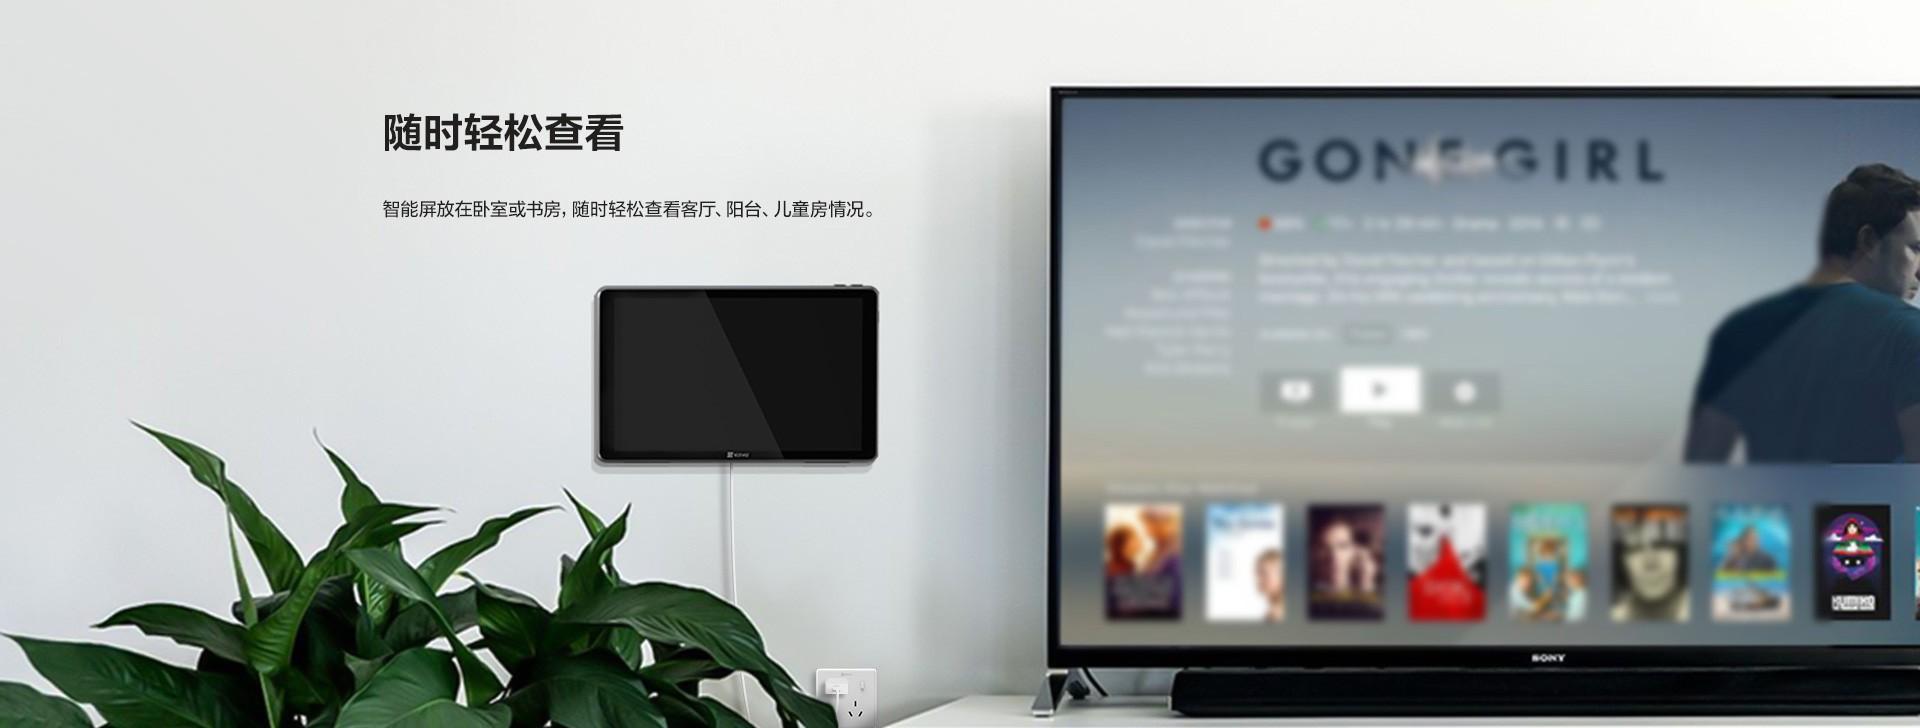 SD1-web-修改-20210316.jpg